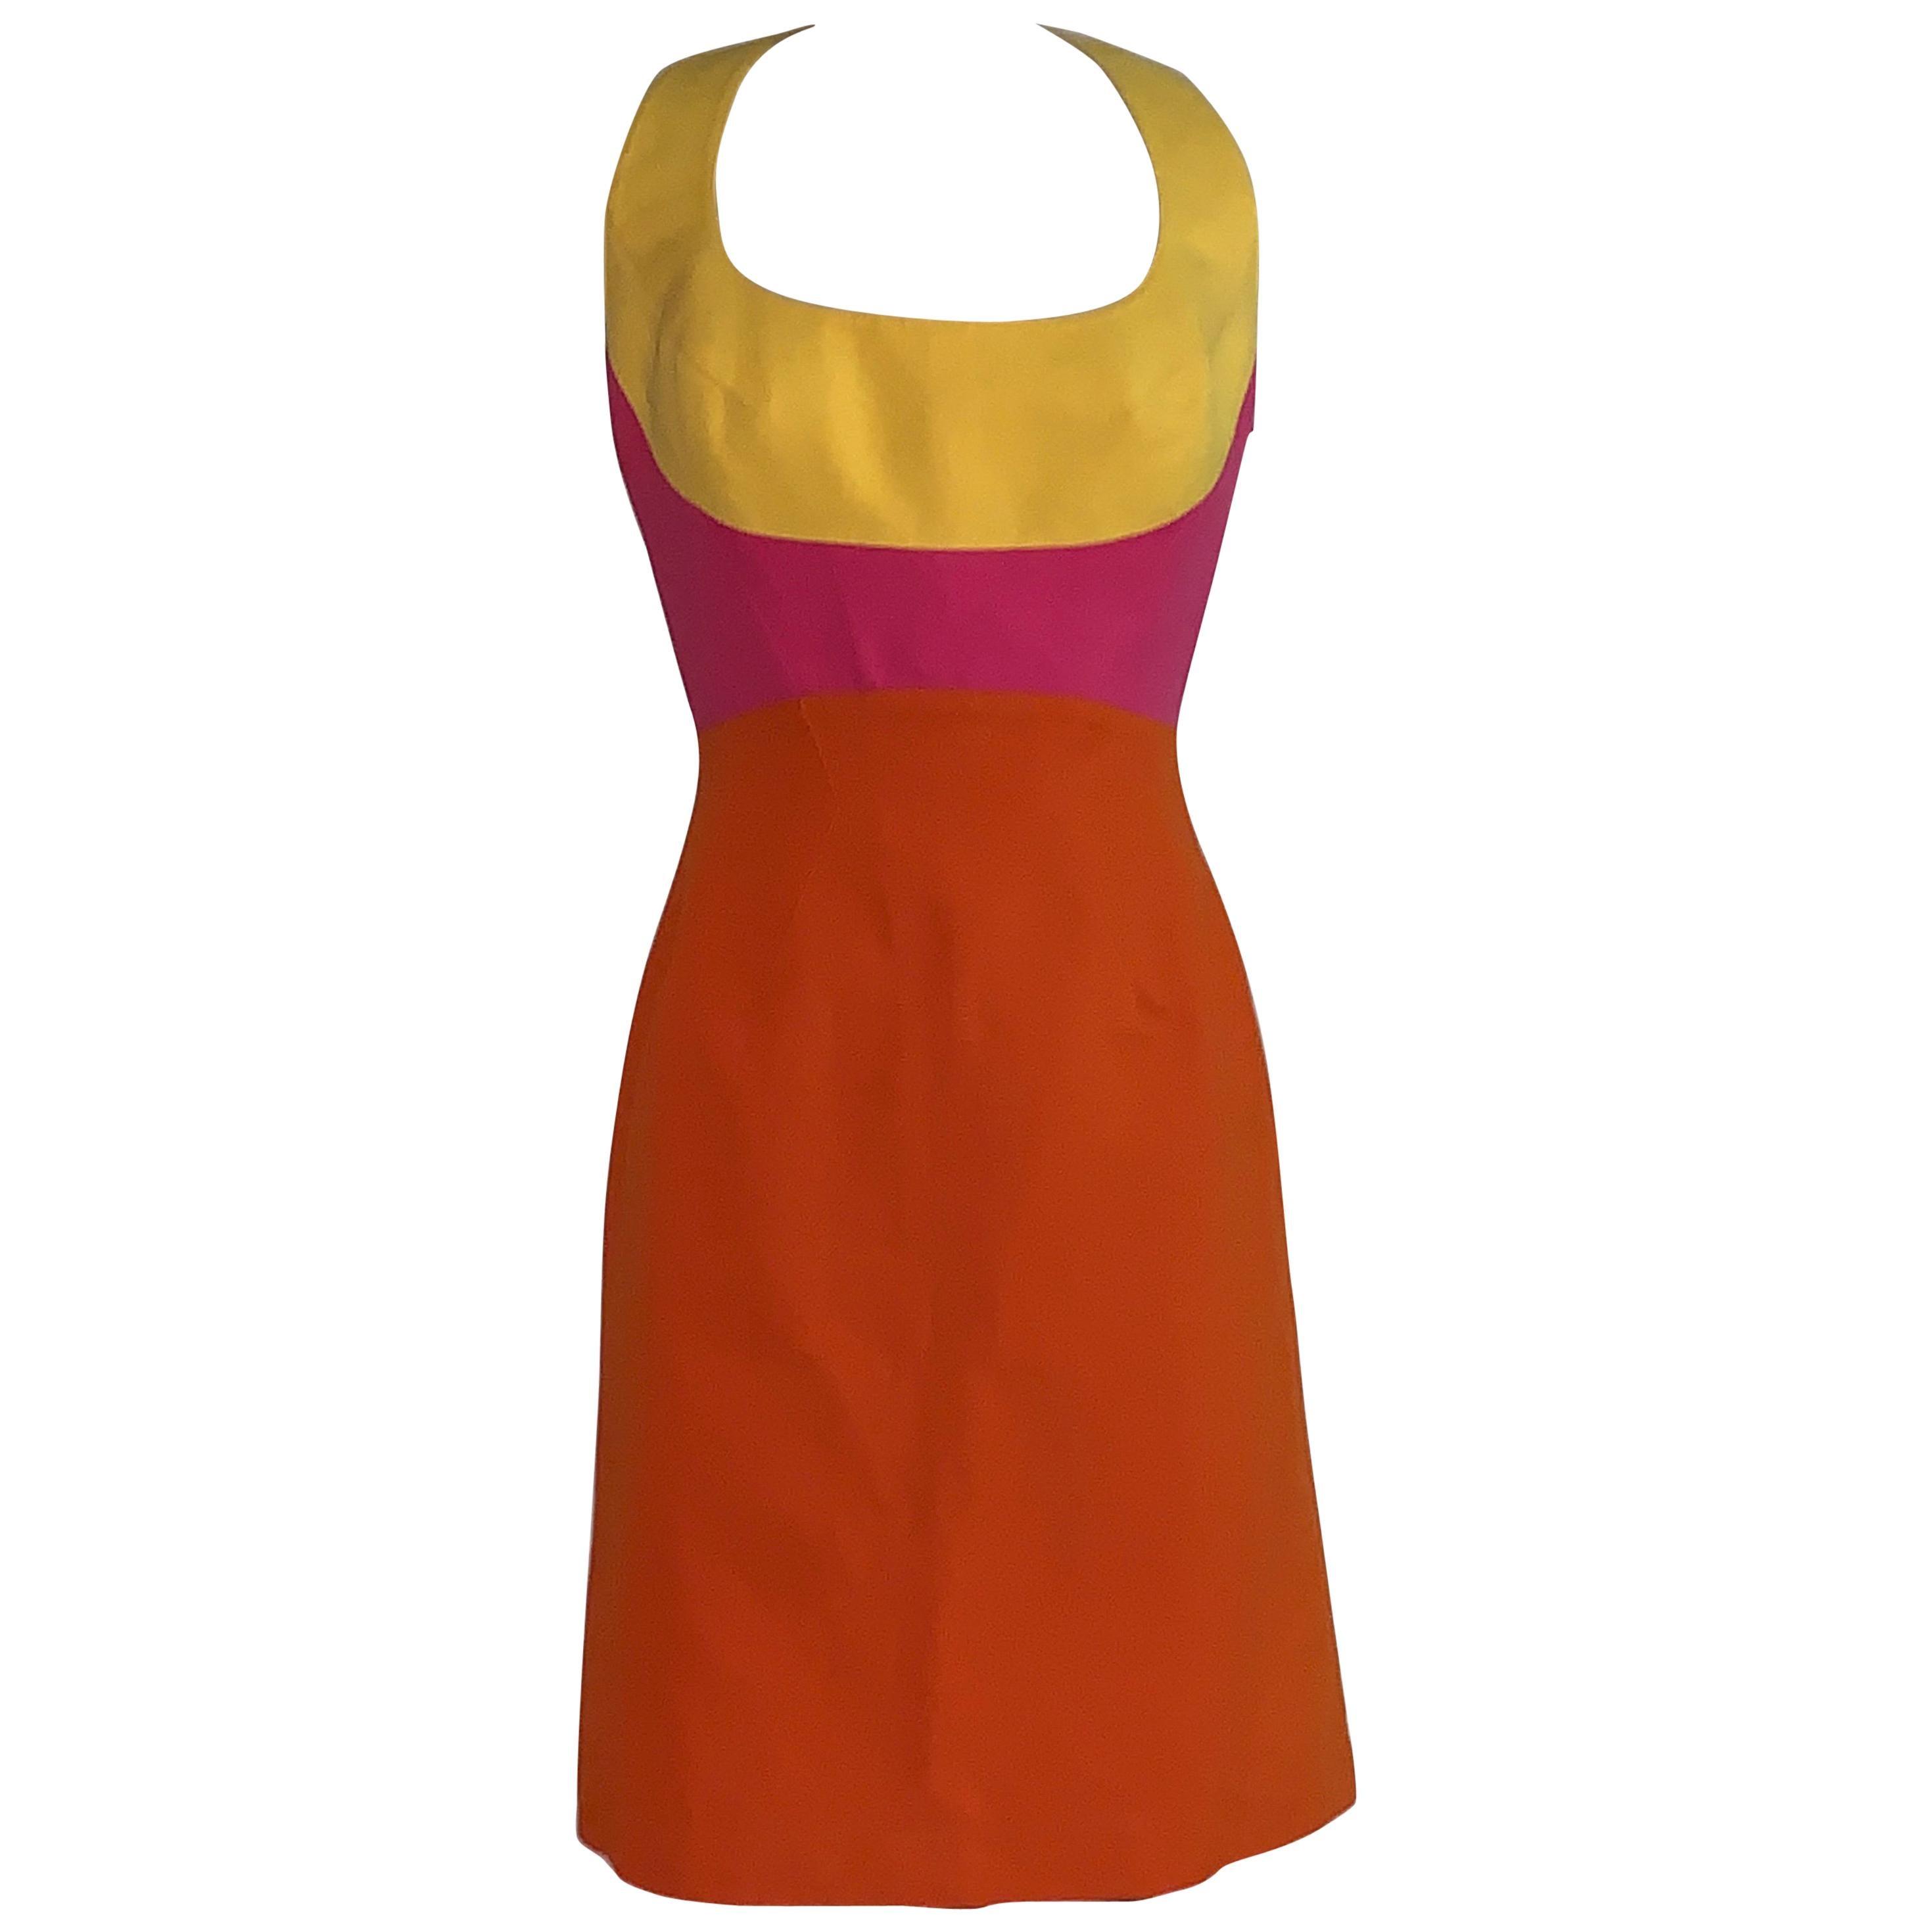 987b3e4422c Vintage and Designer Day Dresses - 9